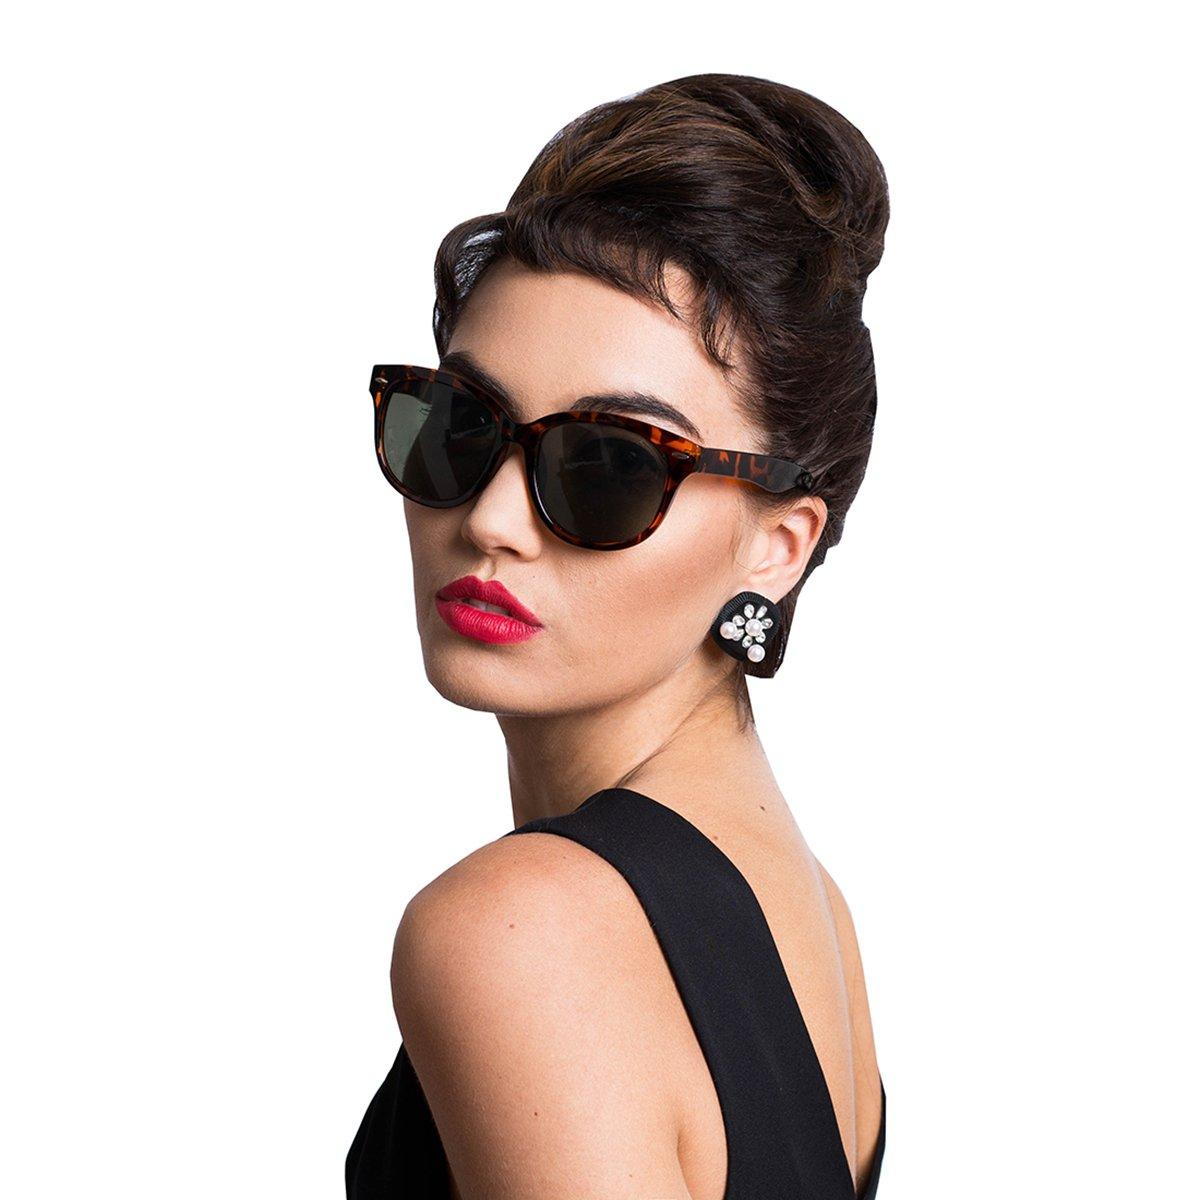 l'atteggiamento migliore 29f37 8498e Audrey Hepburn Breakfast at Tiffany's Cat-Eyed Sunglasses Vintage Retro  Costume Tortoiseshell